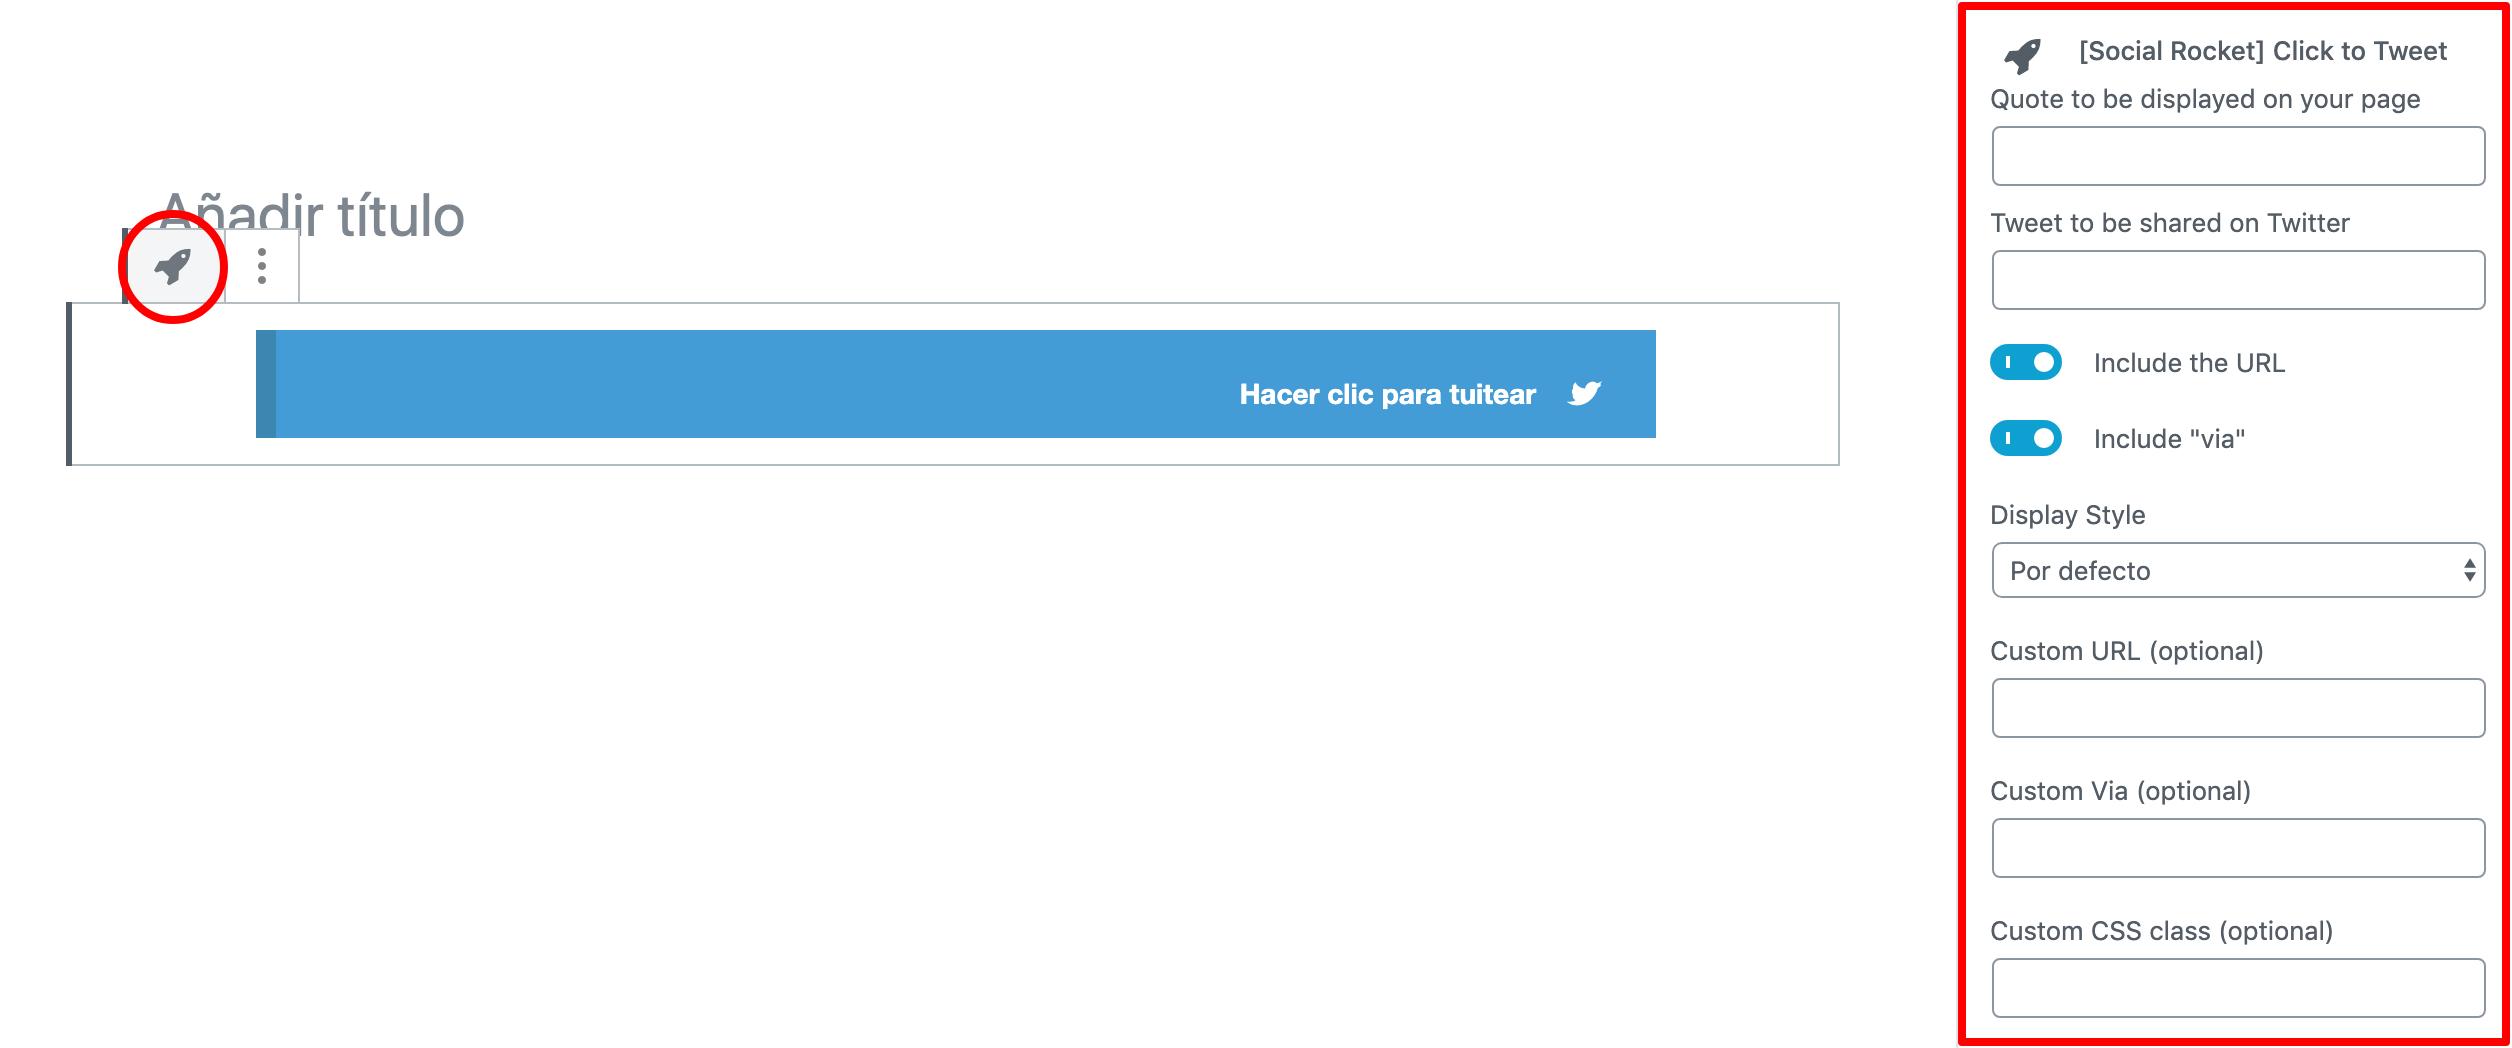 clic to tweet bloque